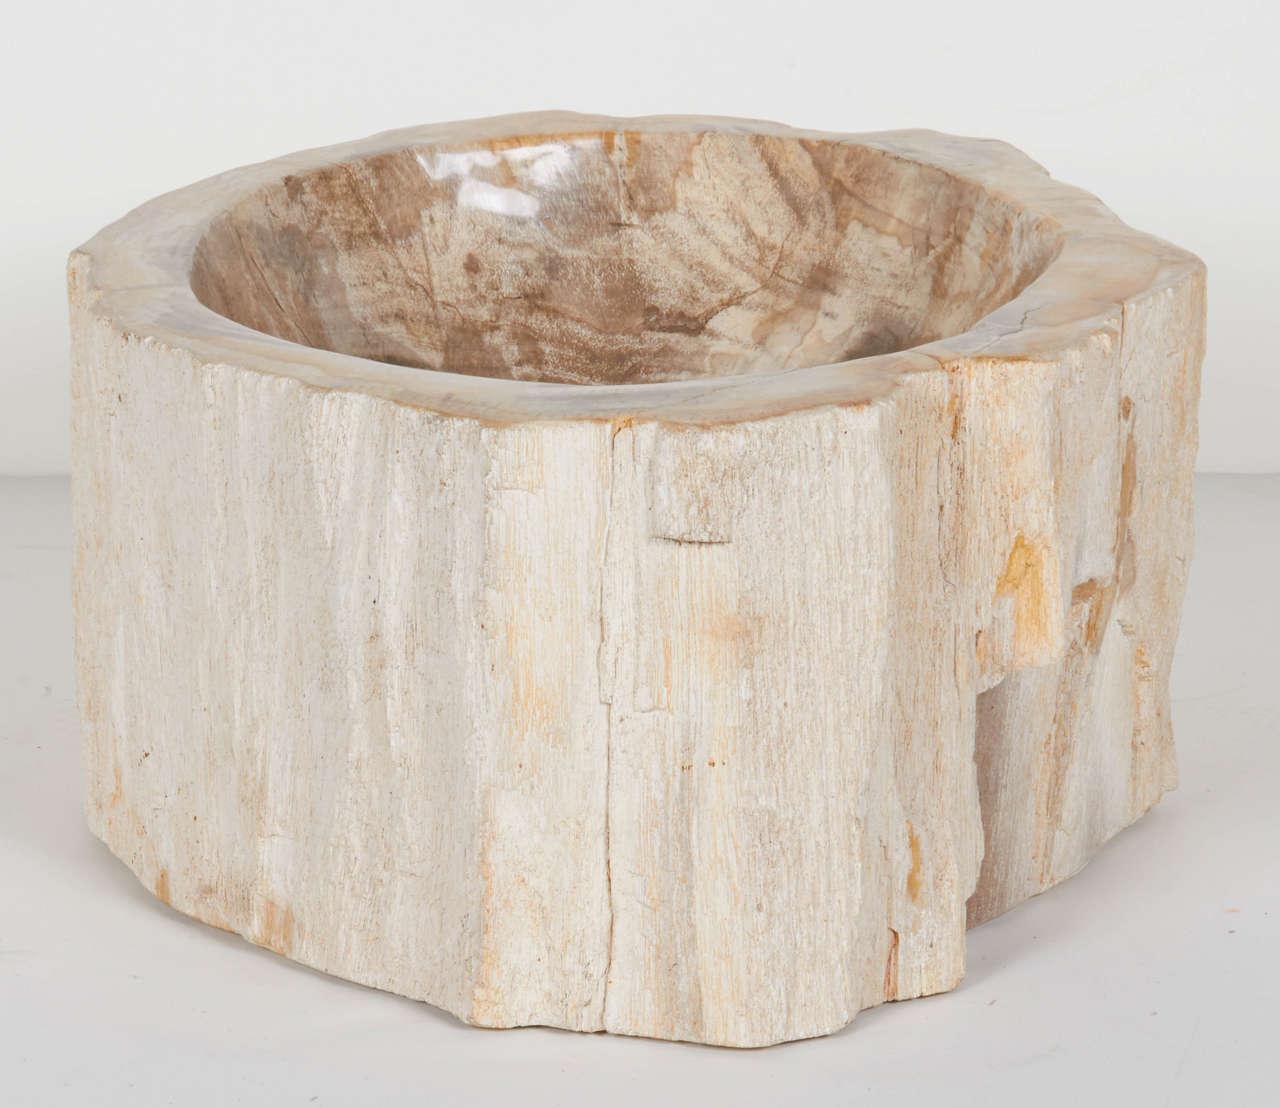 Rare Organic Petrified Wood Large Bowl or Sink at 1stdibs